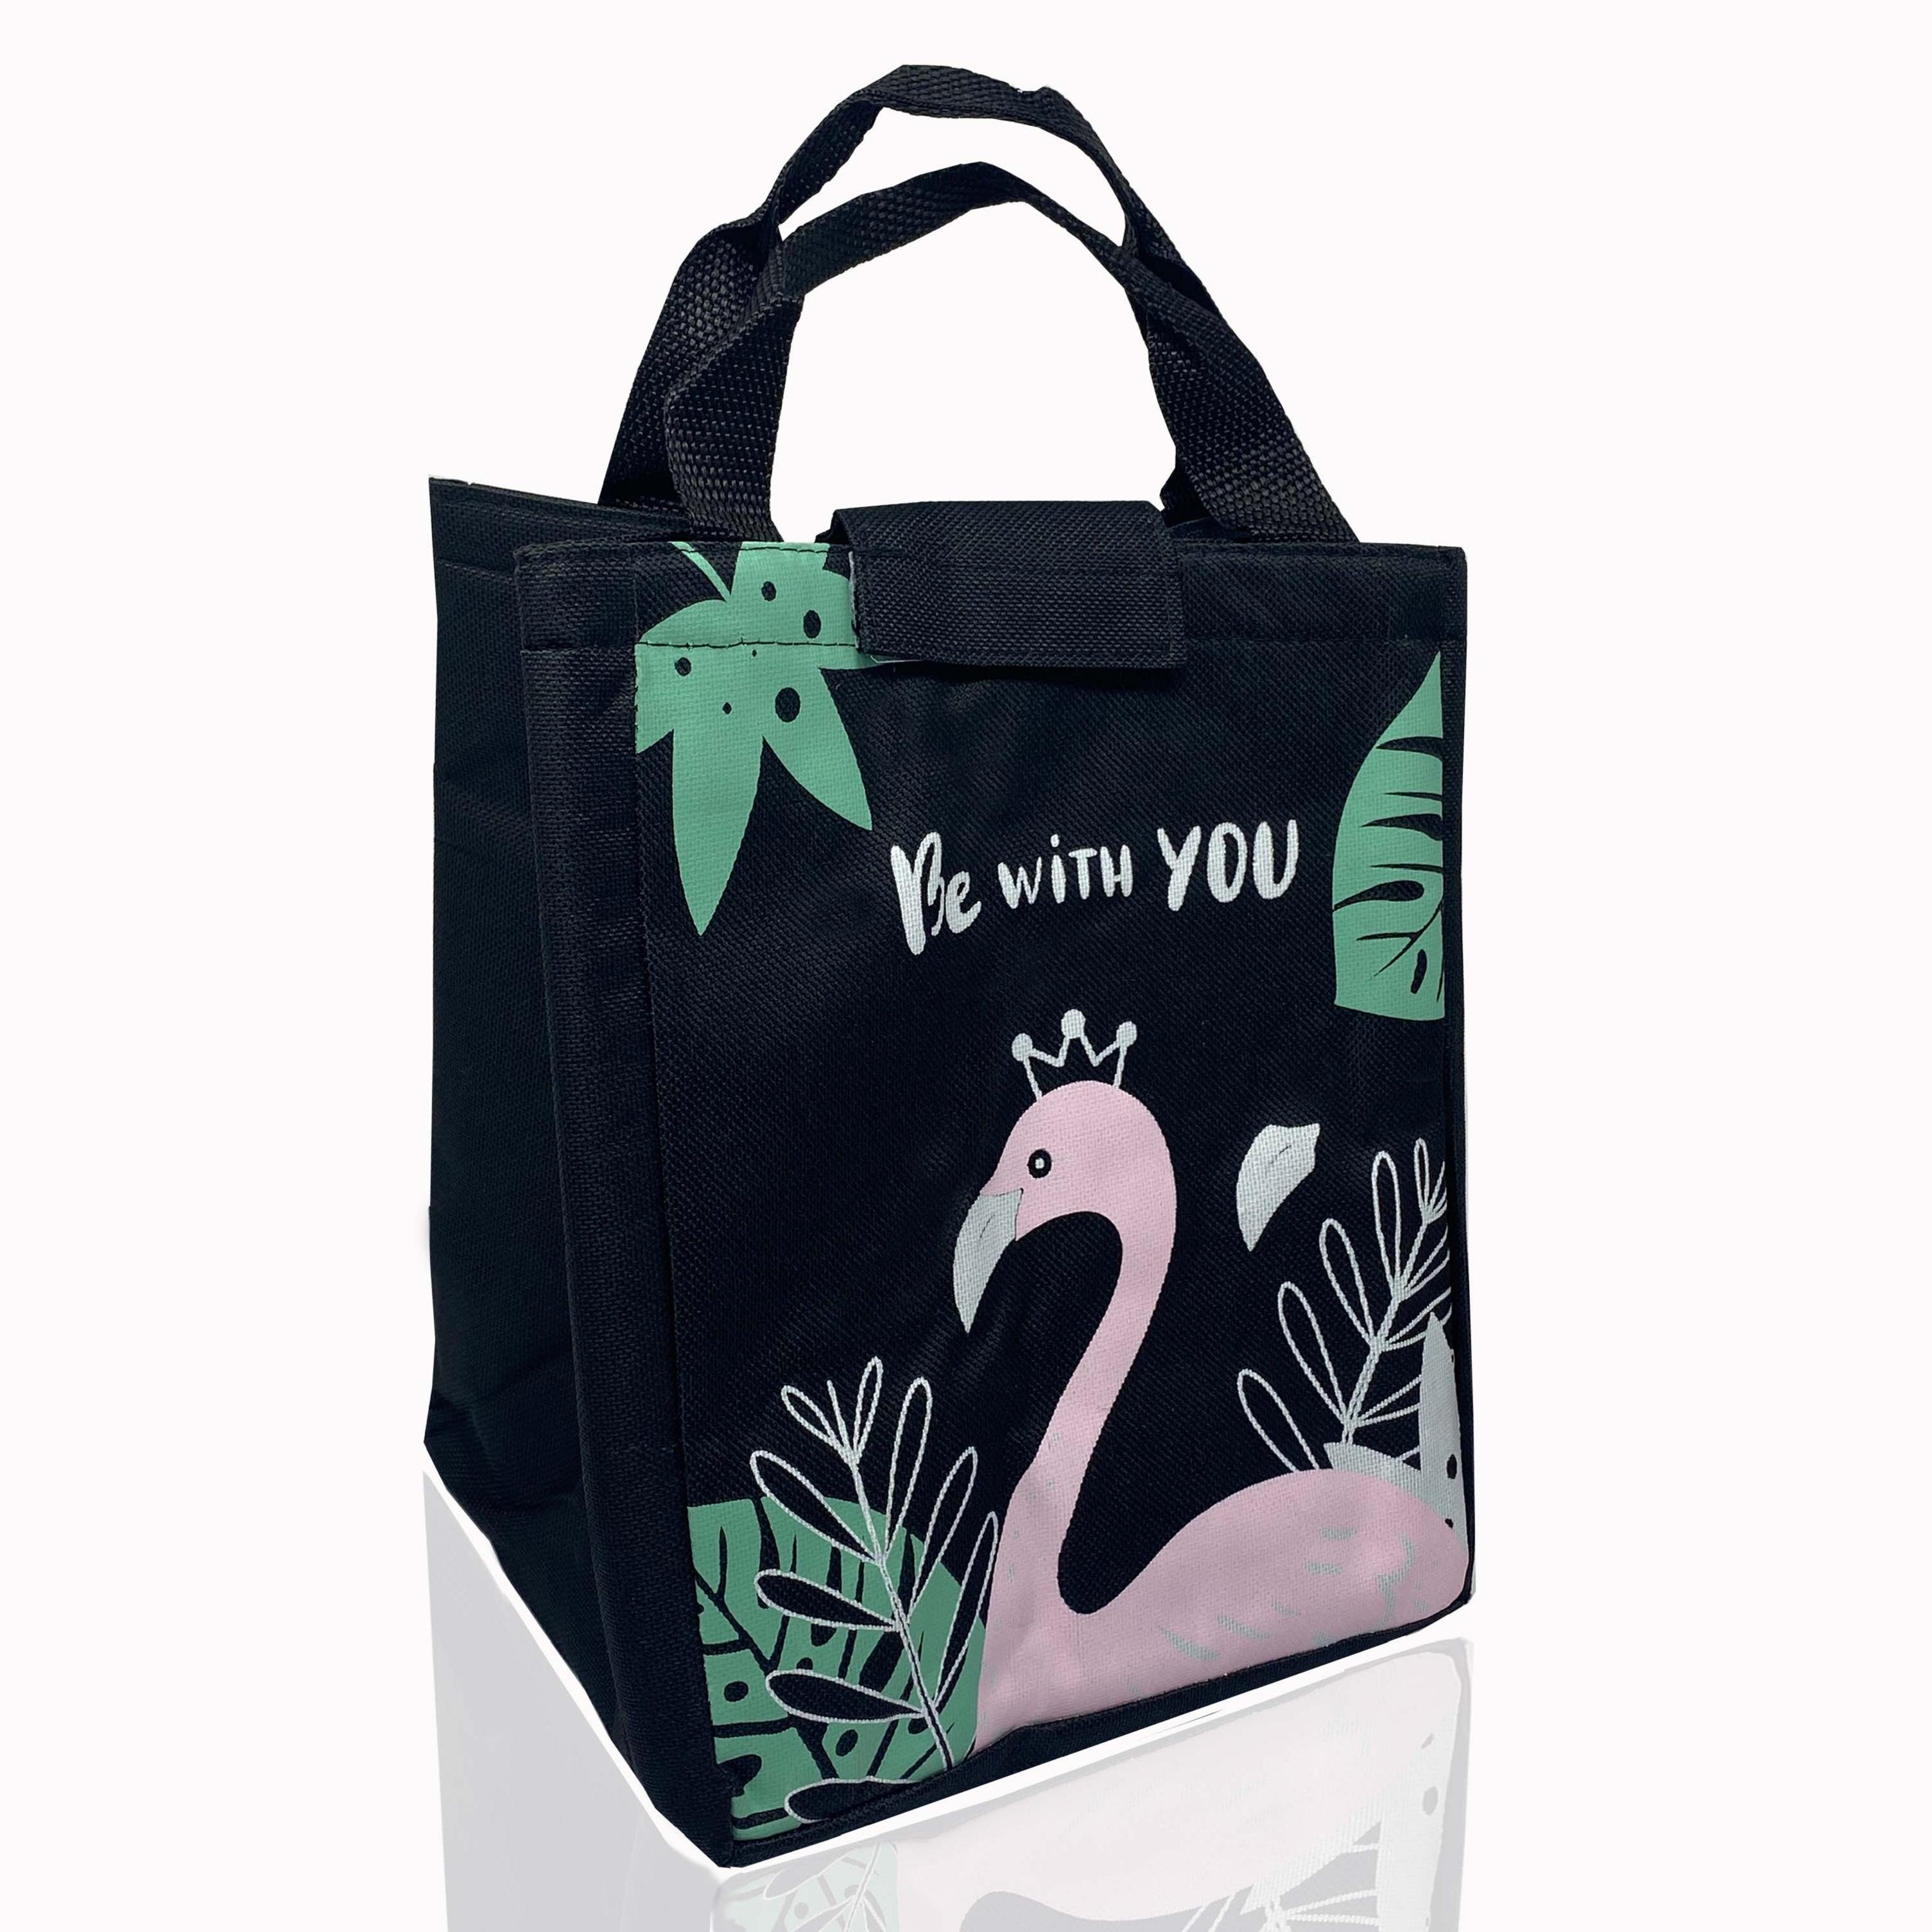 LooMantha Jute Insulated Thermal Multipurpose Waterproof Lunch Bag